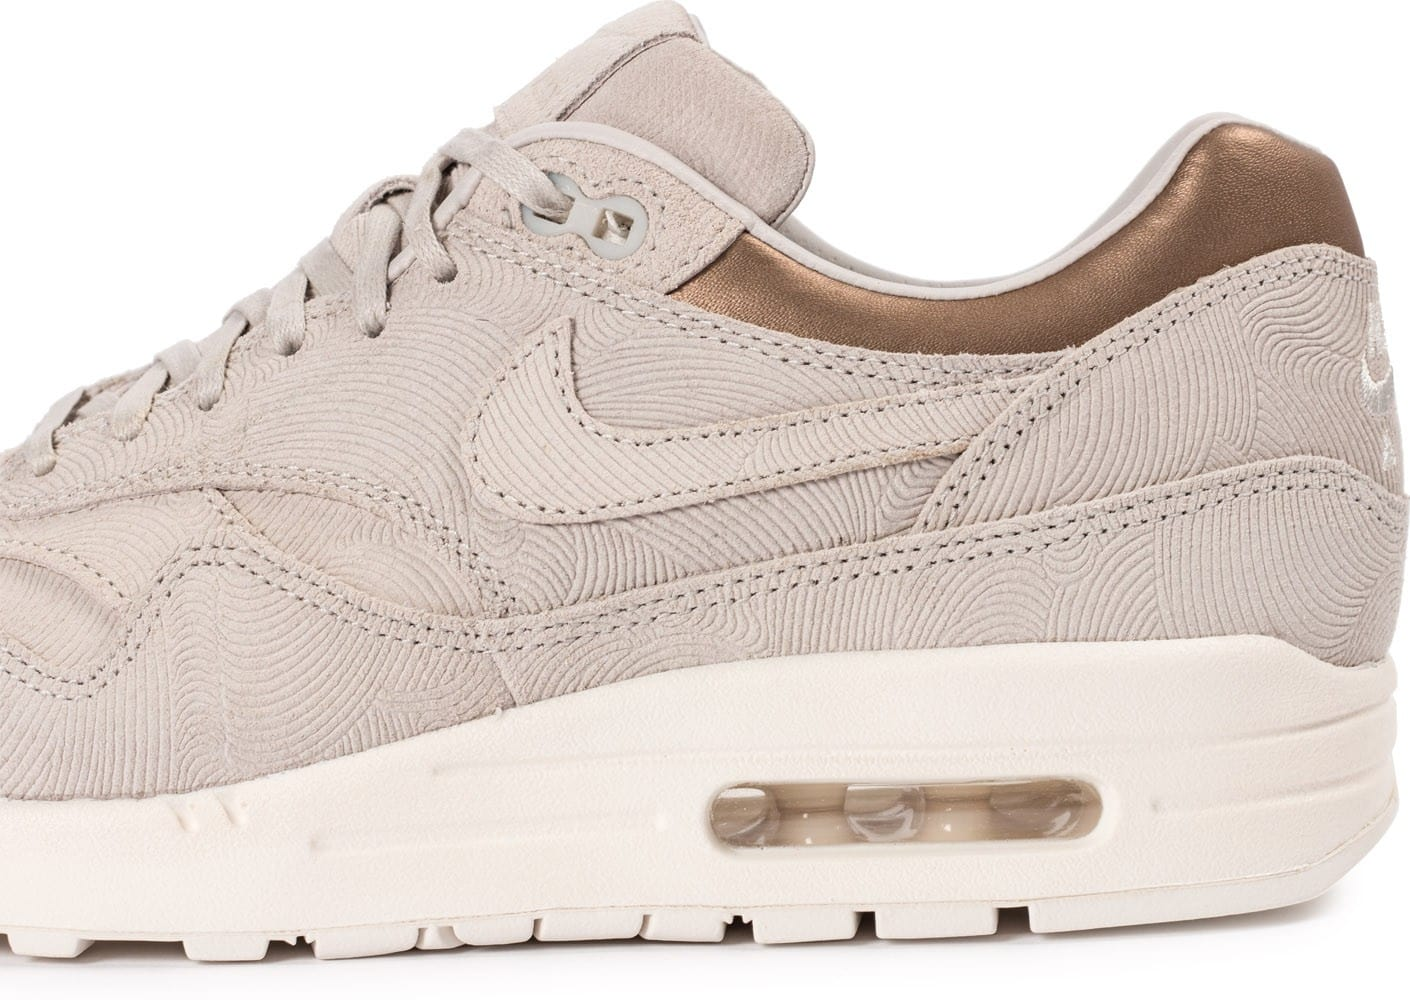 sports shoes 98835 ee5a2 Nike Air Max 1 Premium pour Femme V7804IAJ CouleurMetallic PewterSummit  BlancMetallic Pewter Nike WMNS Air Max 1 Premium, Chaussures de Gymnastique  Femme ...